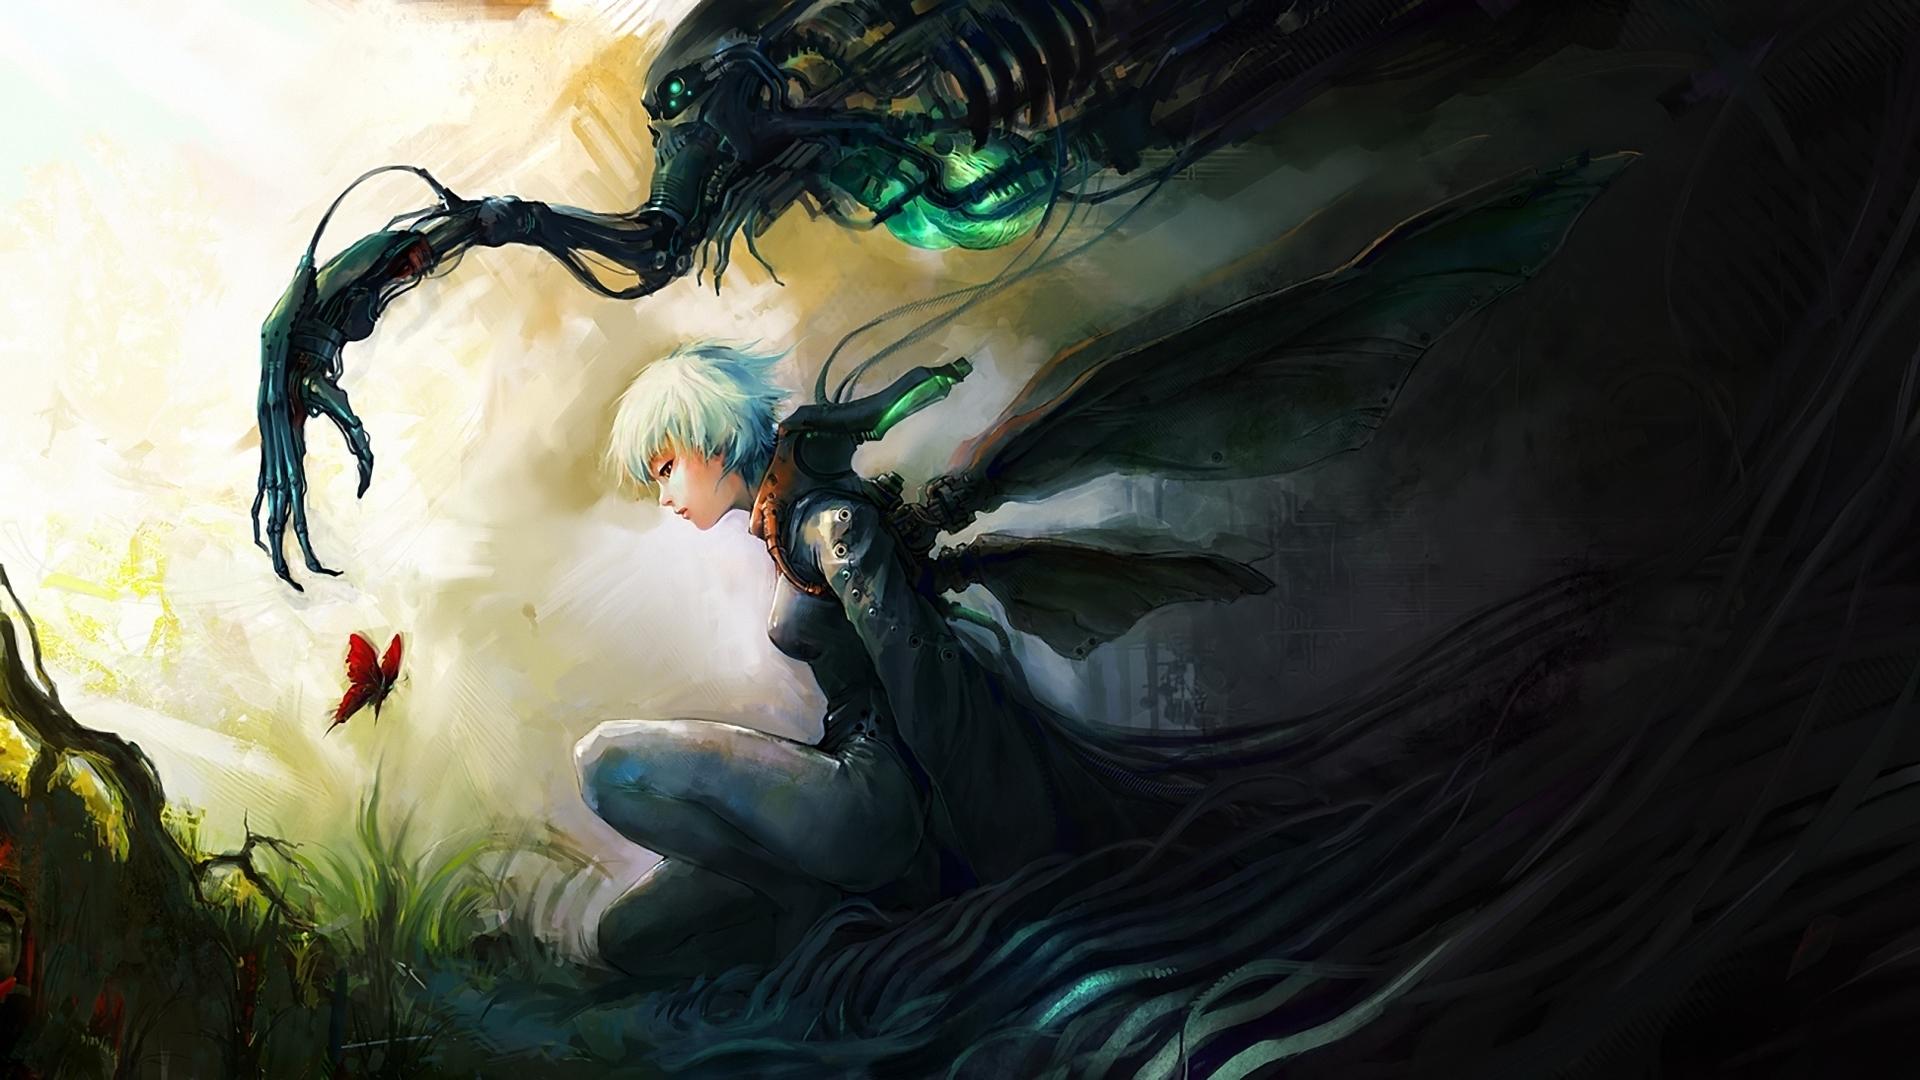 Airbrushing anime fantasy cg digital art wallpaper background 1920x1080